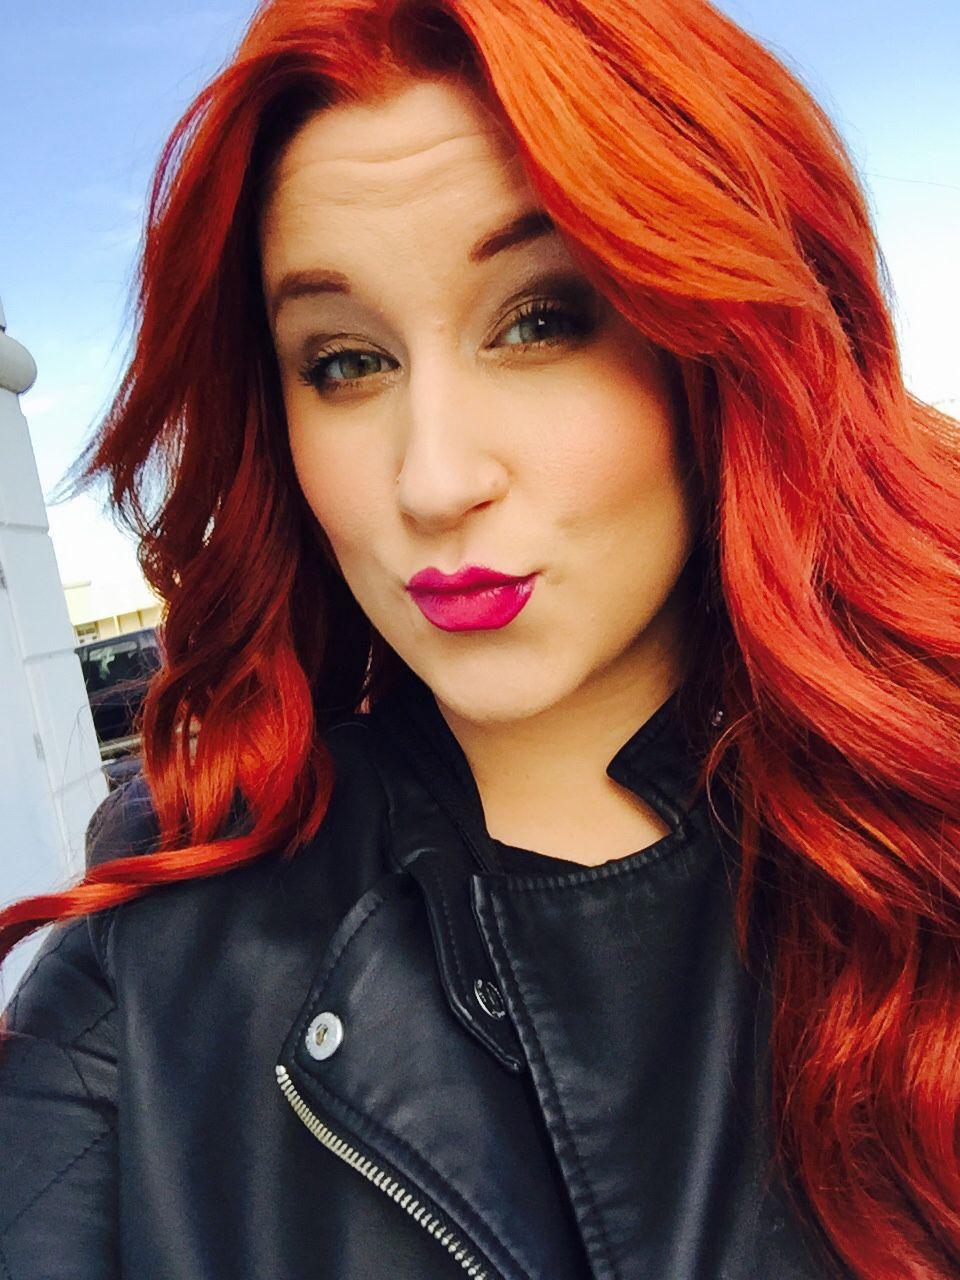 Redhead. Samantha Minyard